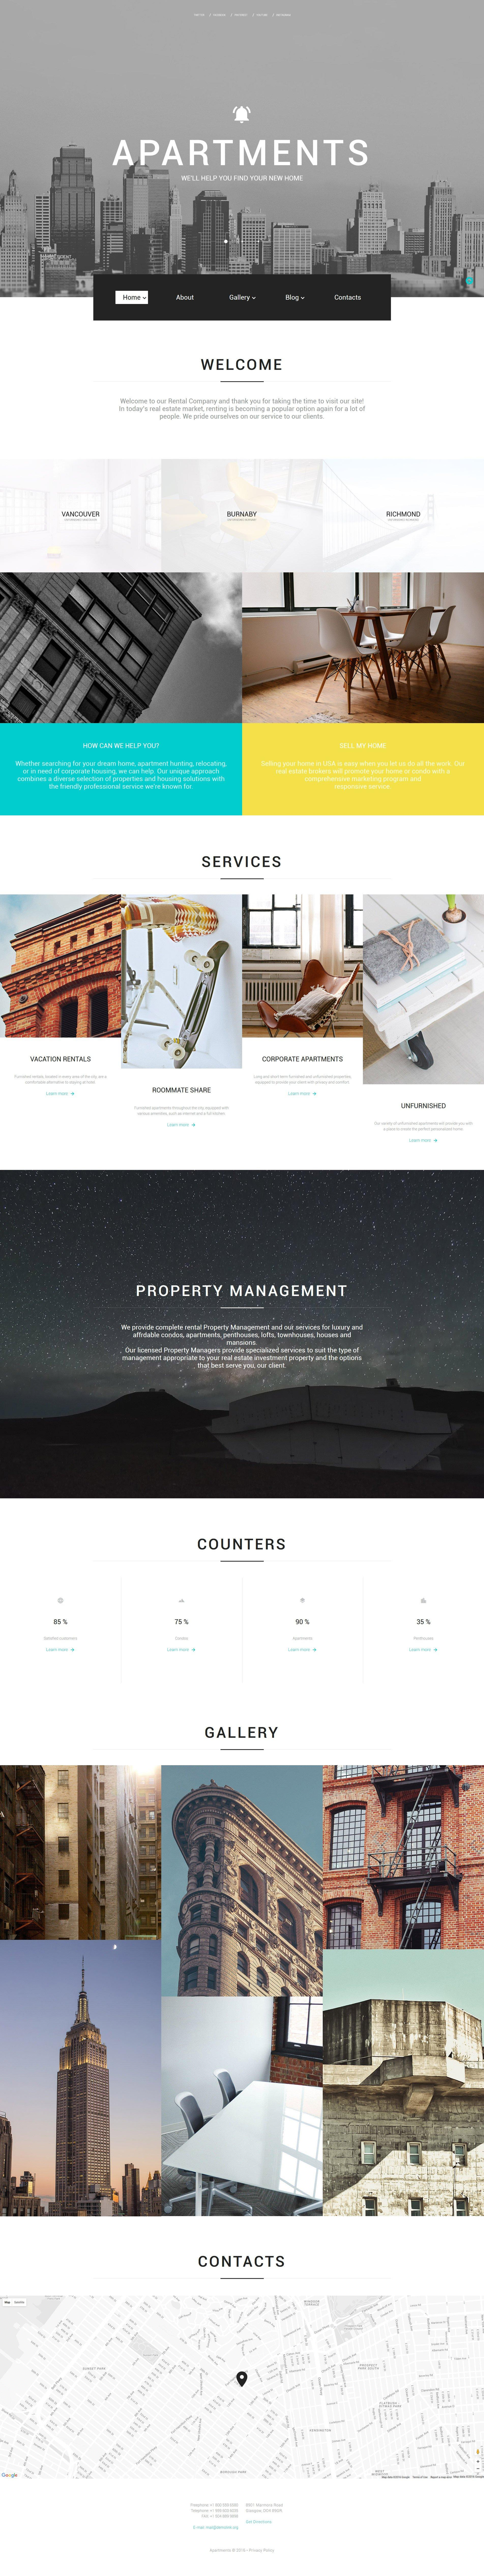 "Website Vorlage namens ""Apartments"" #58726 - Screenshot"